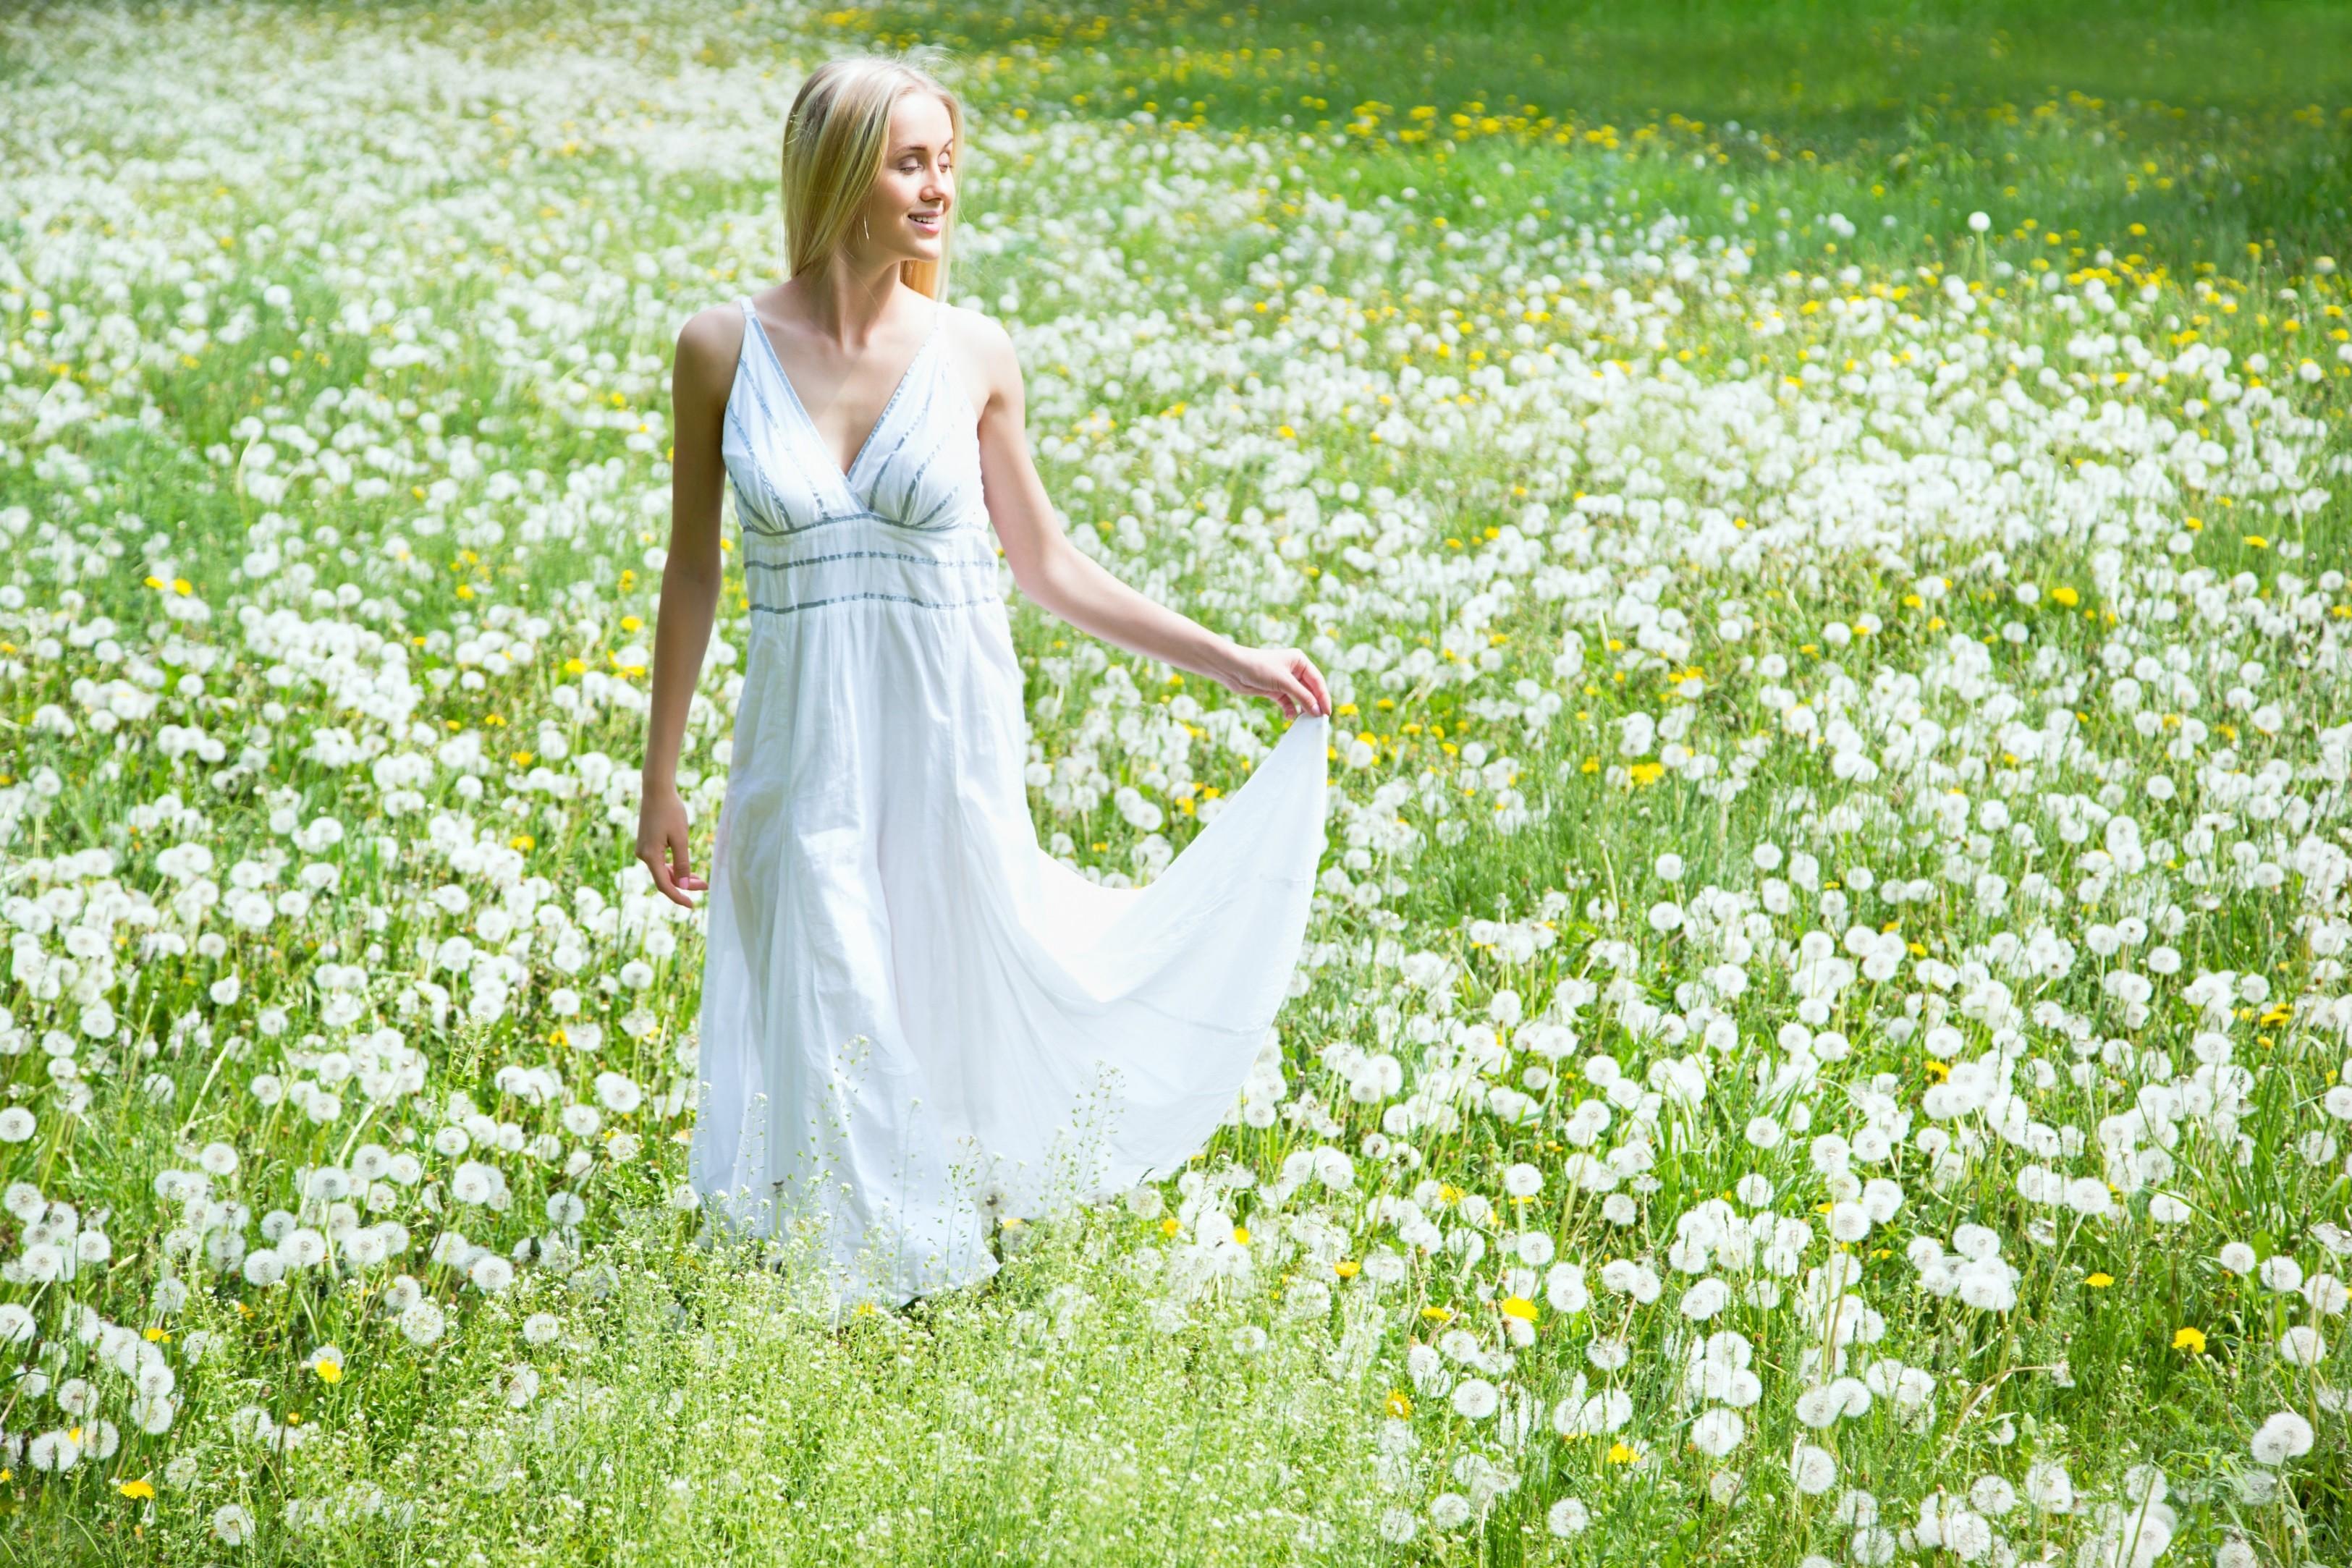 Hintergrundbilder : Frauen im Freien, Frau, Modell-, Gras, Feld ...